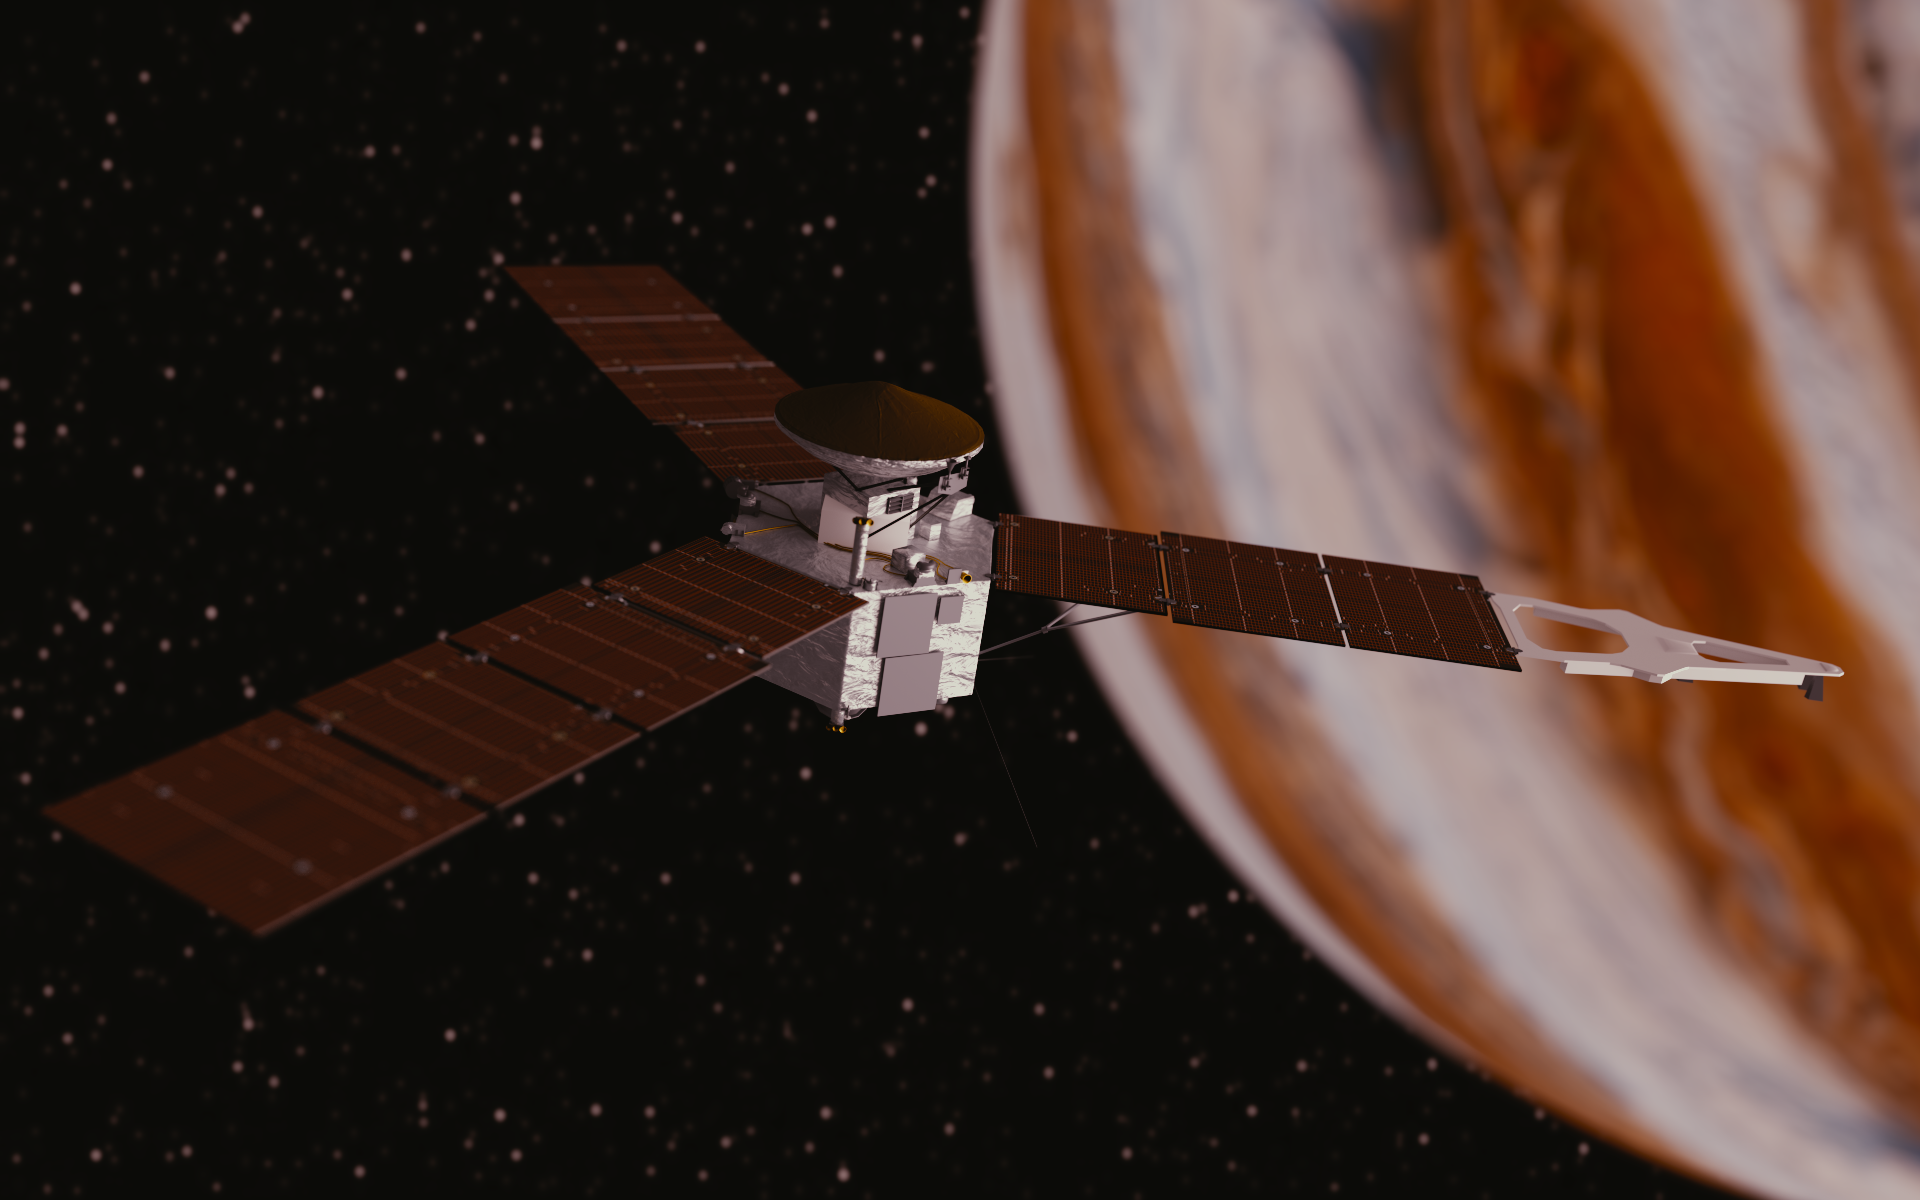 Juno-1920x1200.png